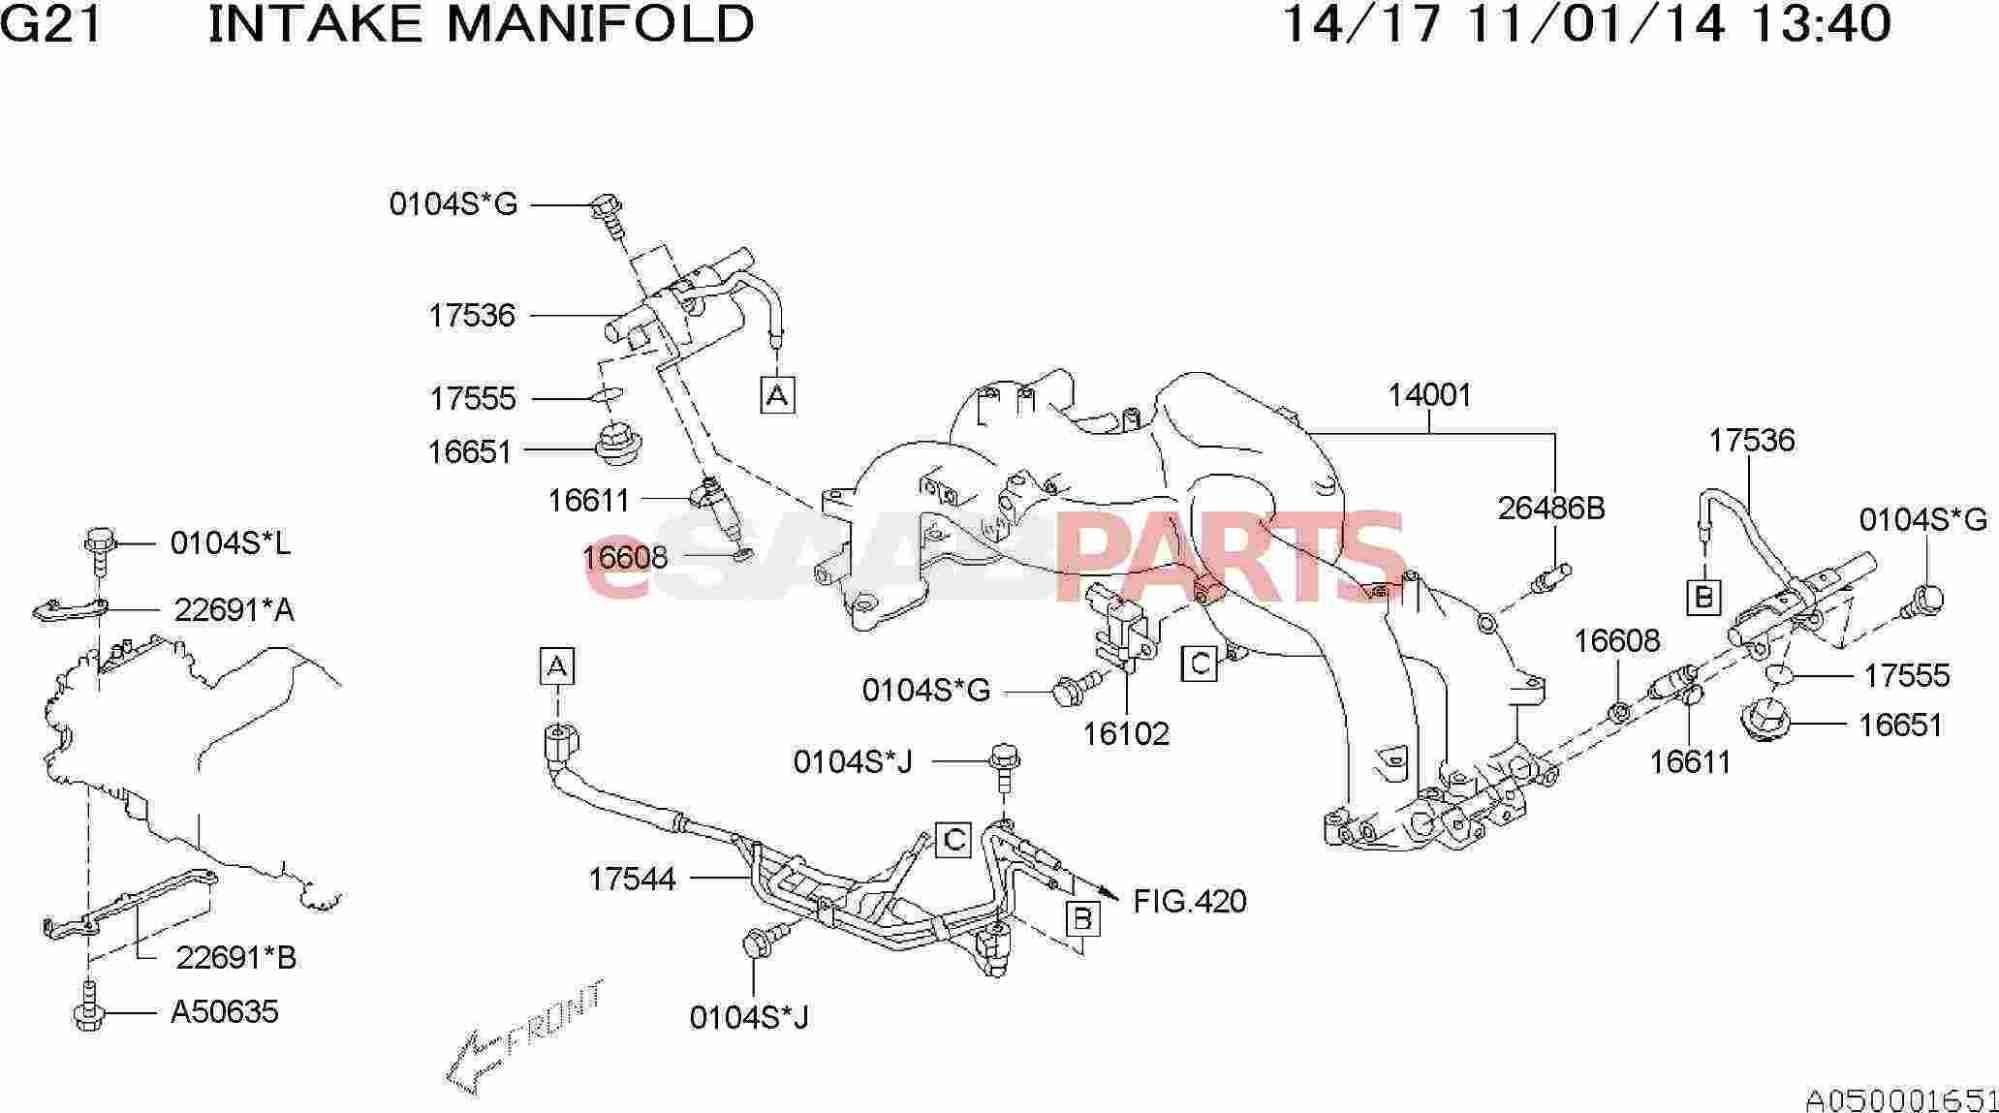 hight resolution of esaabparts com saab 9 2x engine parts engine internal intake manifold intake manihold body fuel